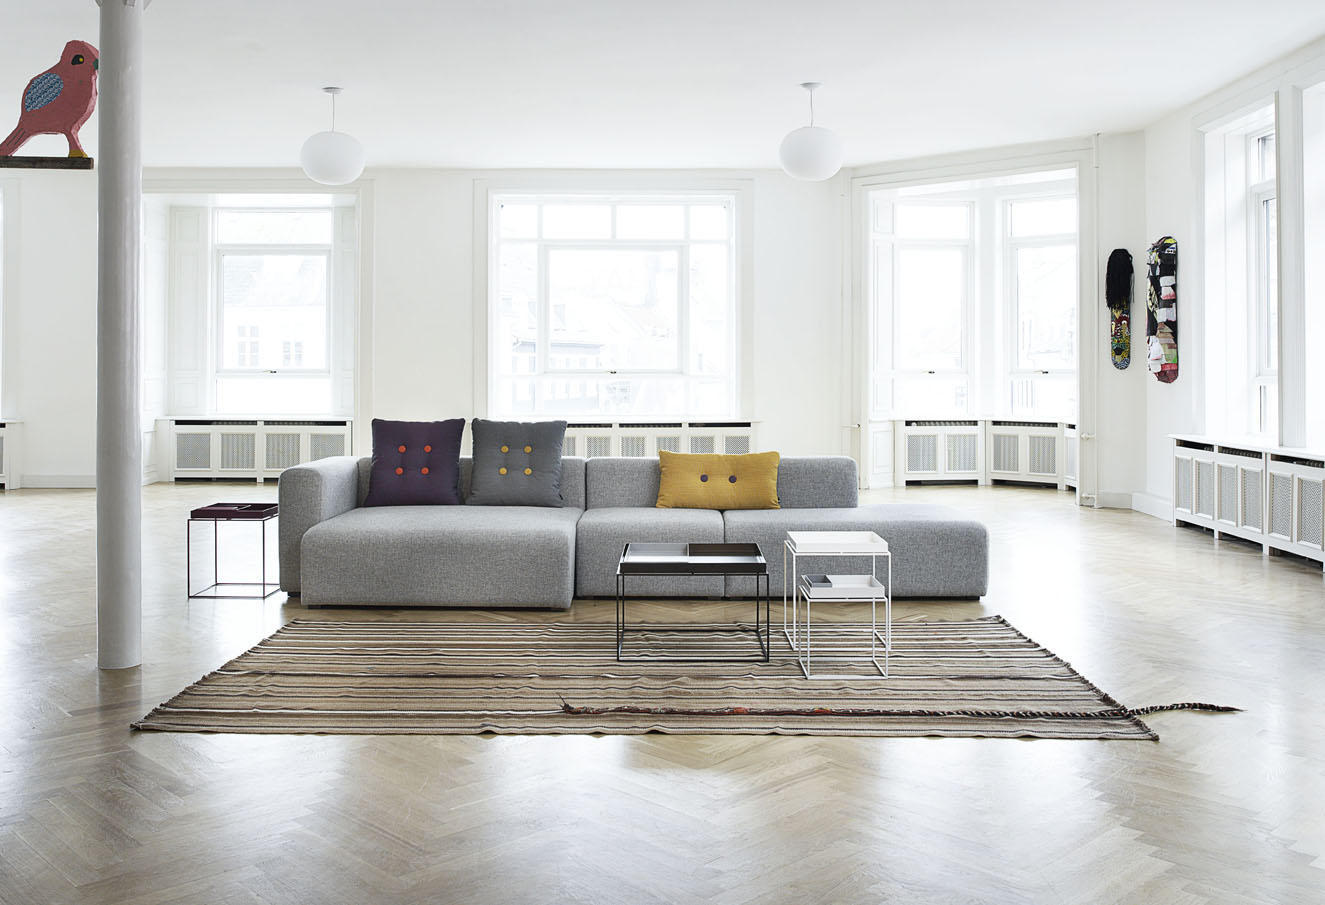 hay mags soft sofa bank la curacao guatemala sofas from architonic